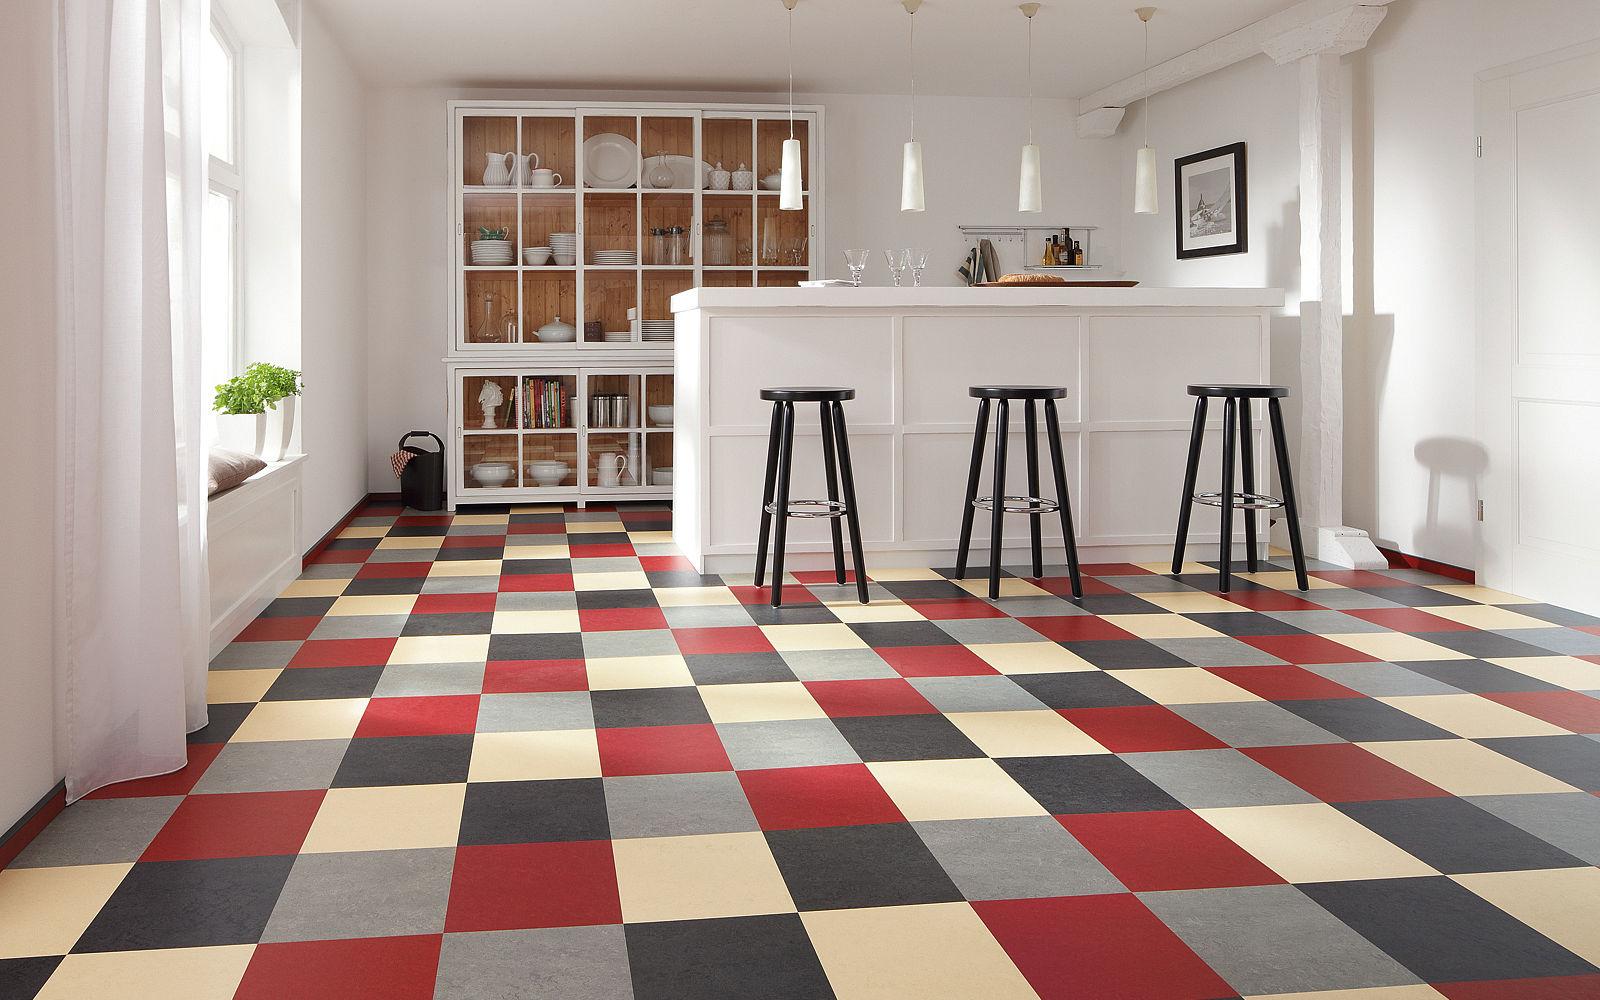 podne obloge od linoleuma asopis podovi. Black Bedroom Furniture Sets. Home Design Ideas